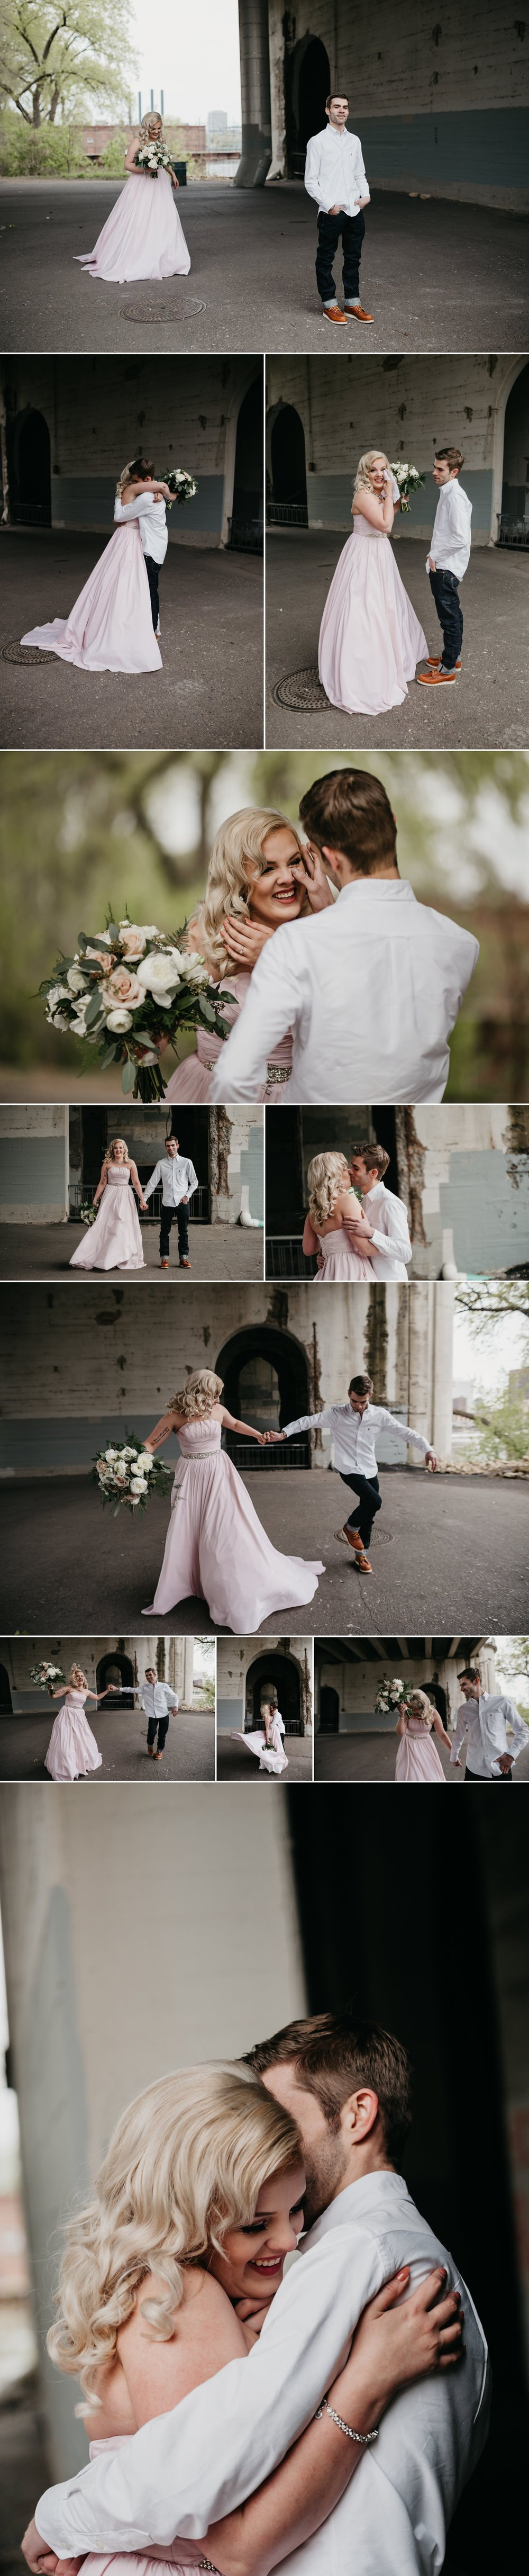 Minnesota Wedding Photographer 2.jpg